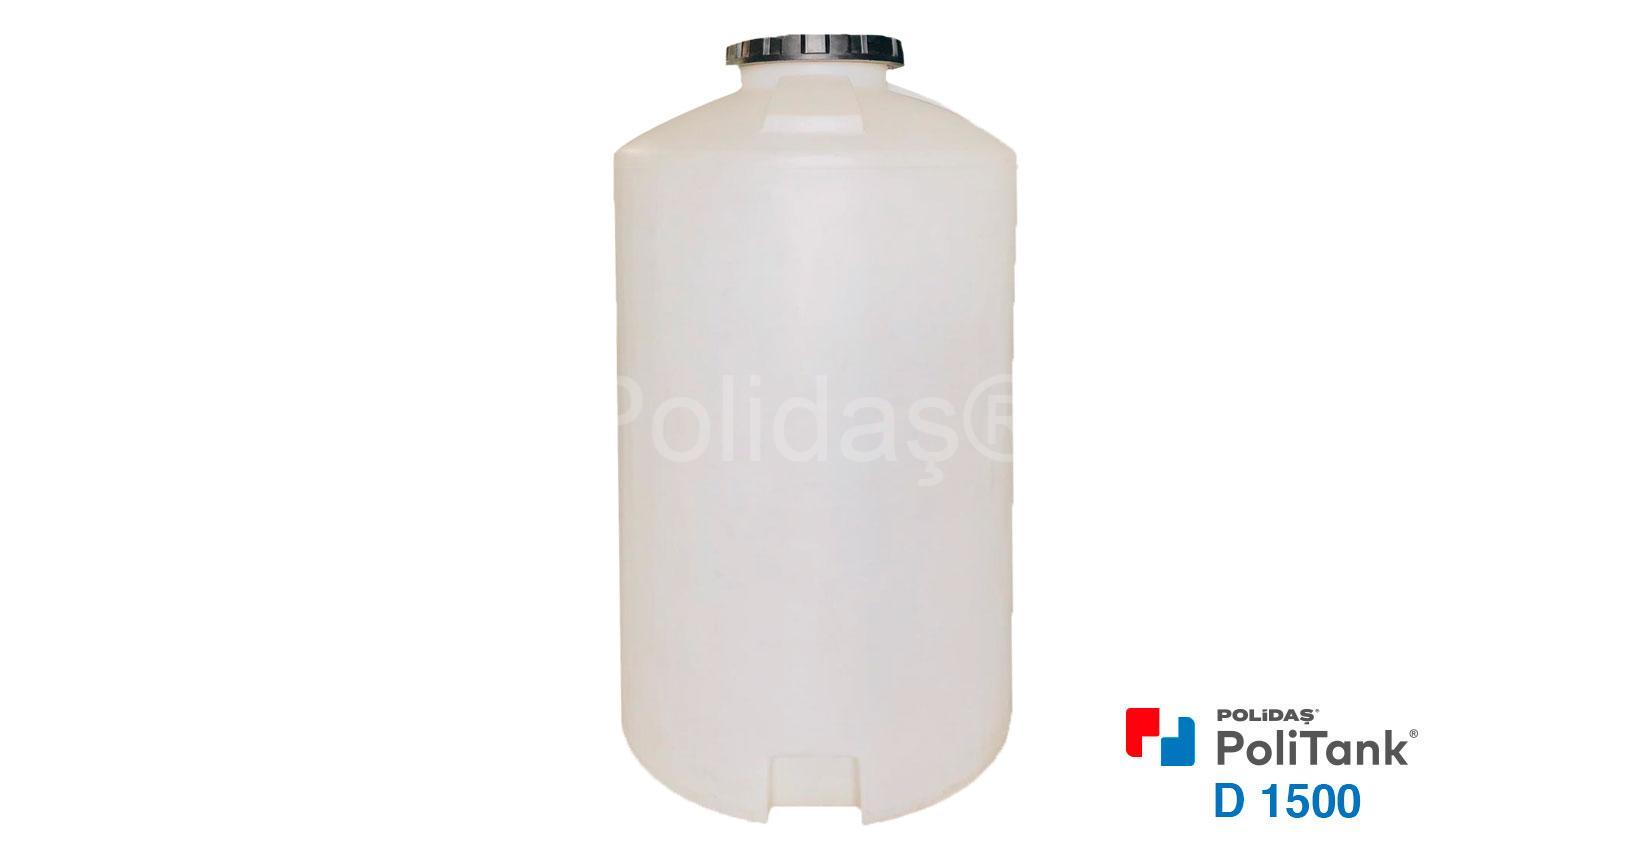 polietilen-dikey-su-tanki-d1500